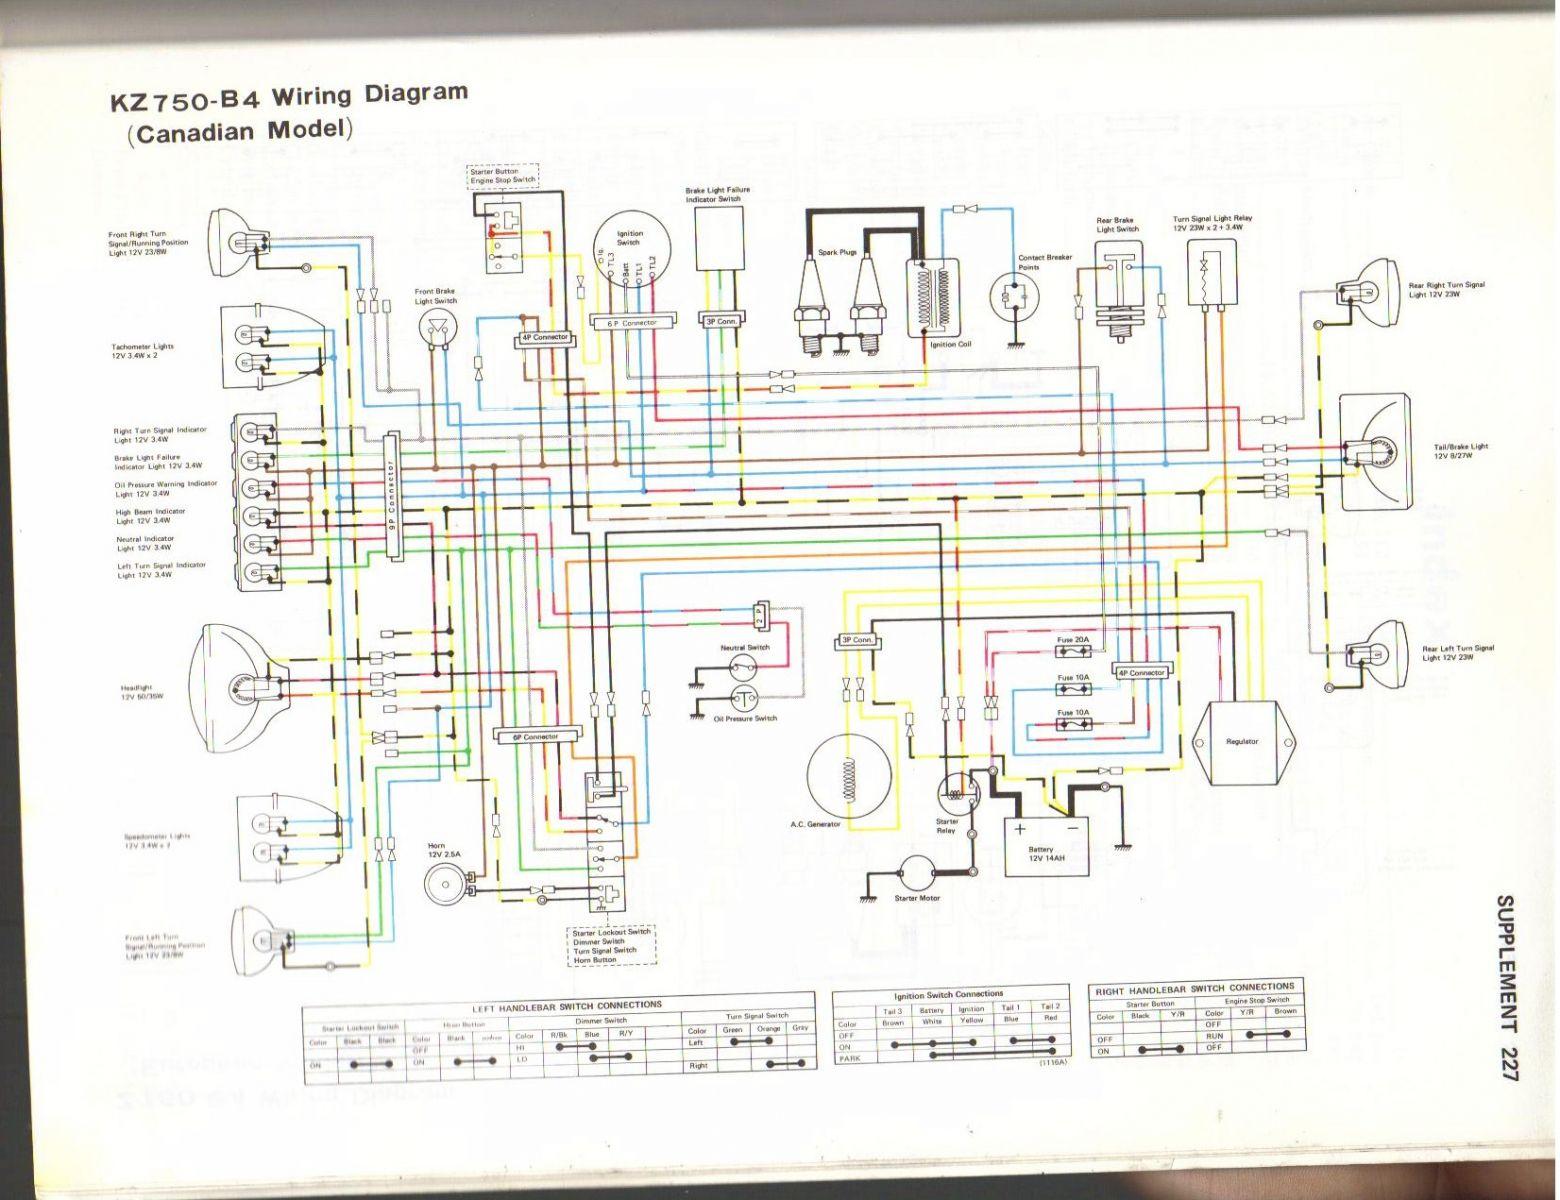 Wiring Diagrams Kawasaki Ninja 300r All Kind Of 650r Diagram Ke100 Electrical And Electronic Abs System Pump